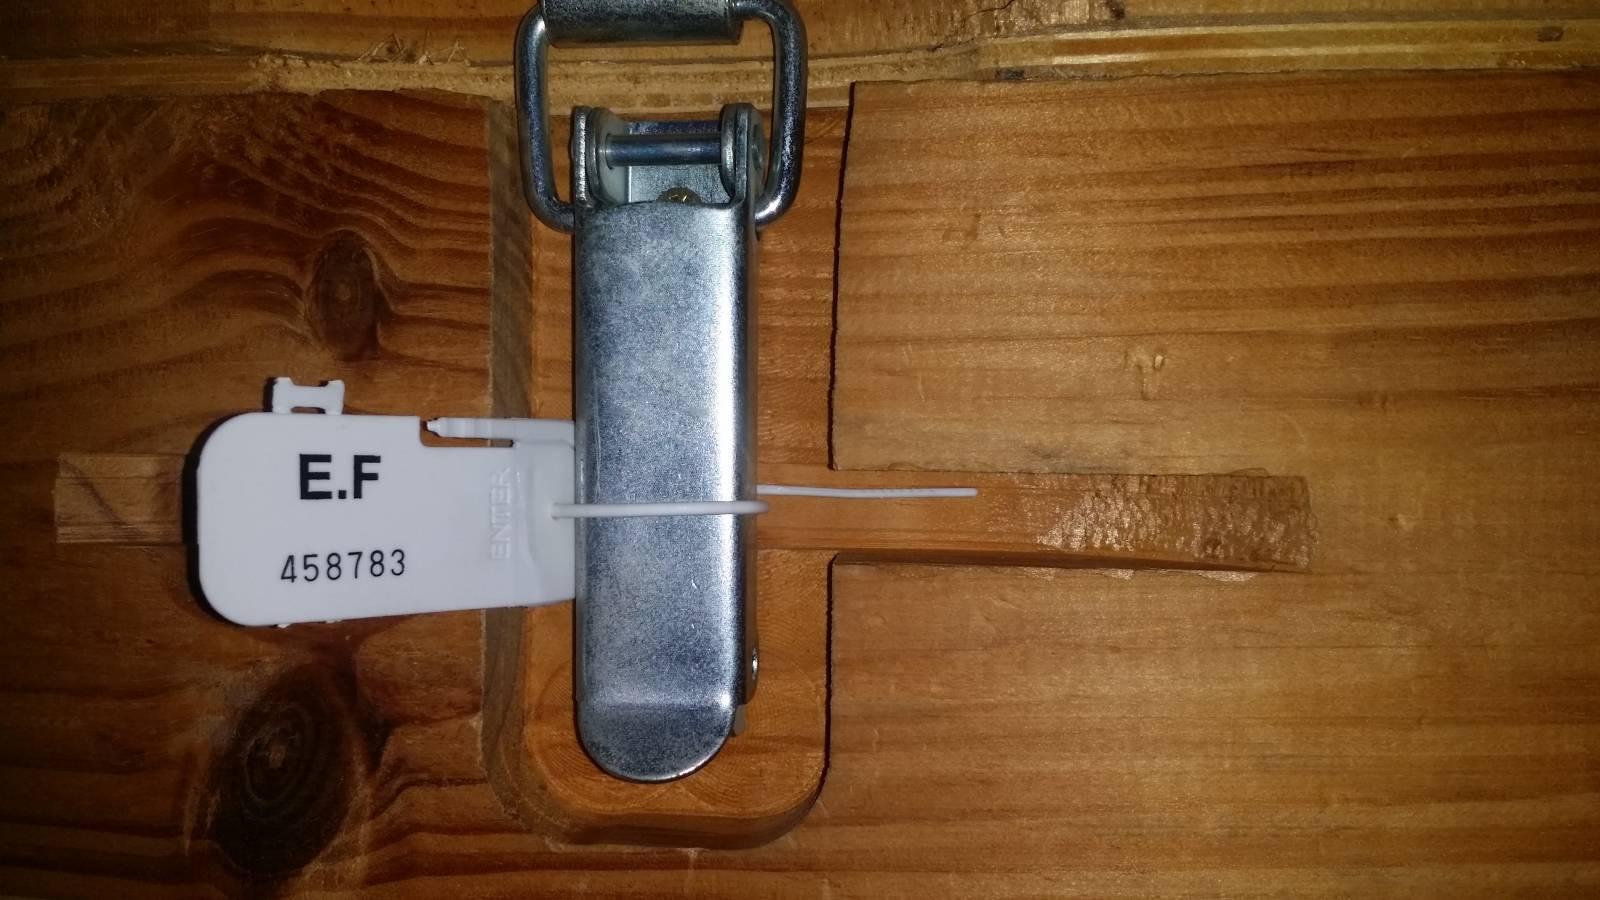 location de garde meubles s curis montpellier adh 34. Black Bedroom Furniture Sets. Home Design Ideas